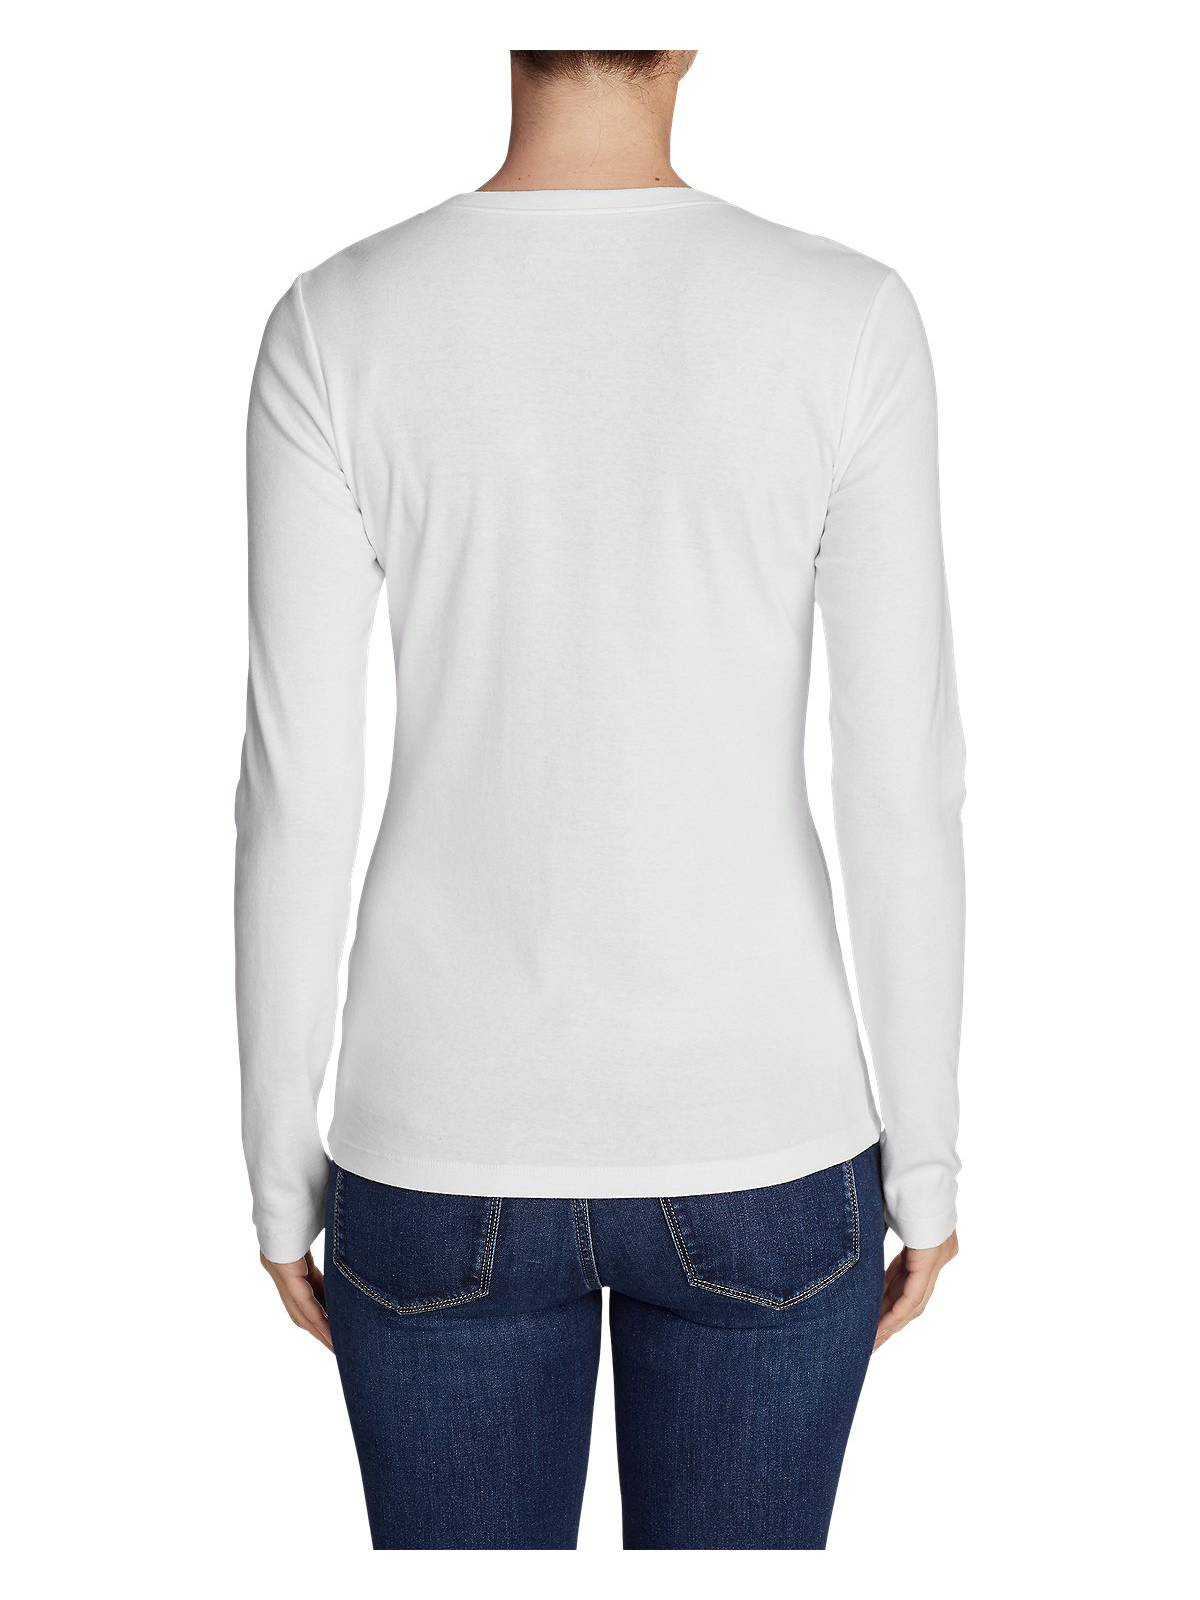 Eddie-Bauer-Women-039-s-Favorite-Long-Sleeve-V-Neck-T-Shirt thumbnail 31